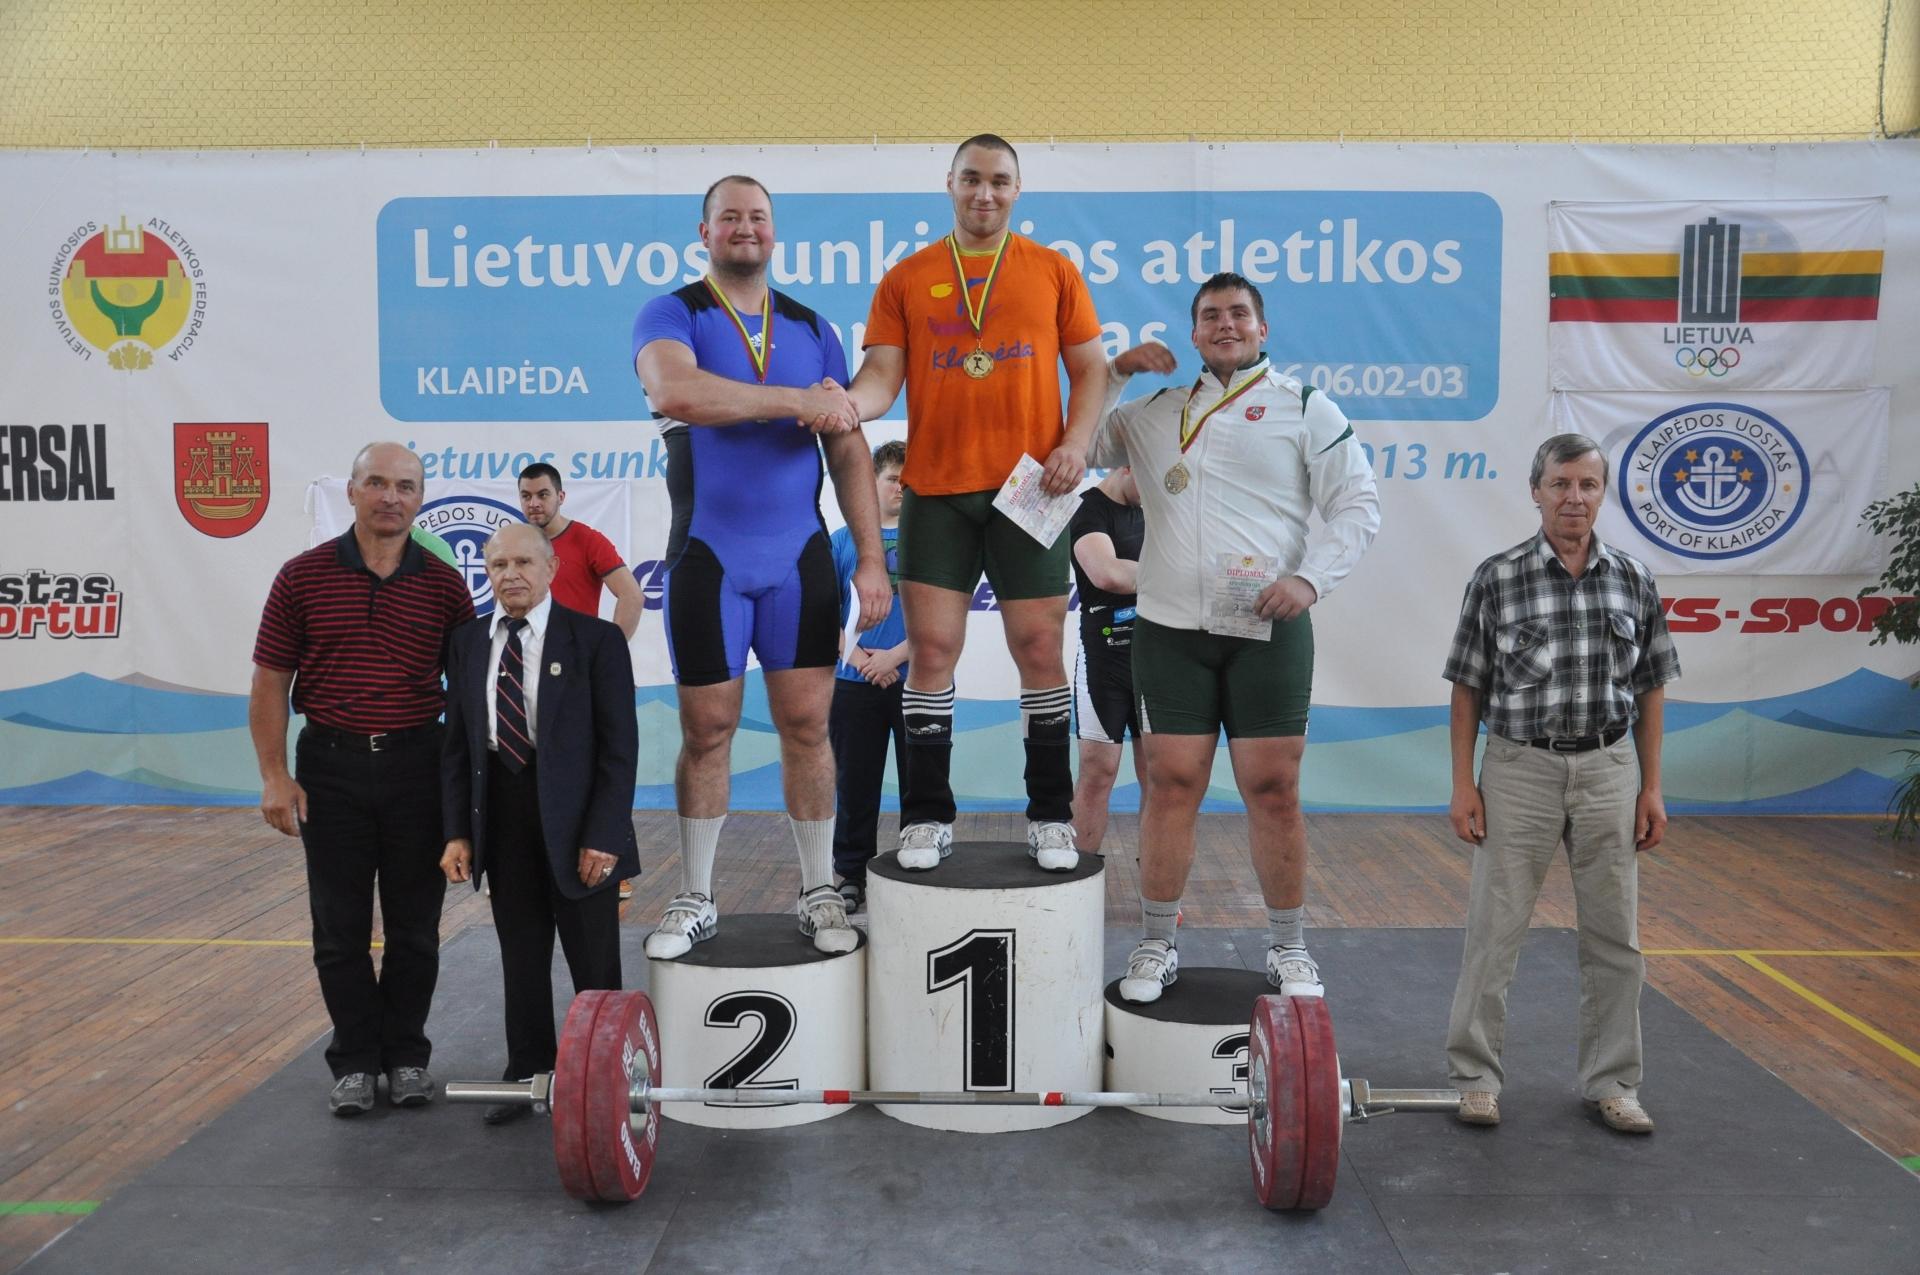 Vincas Šlevinskis, Sergej Lichovoj, Ernestas Sudentas